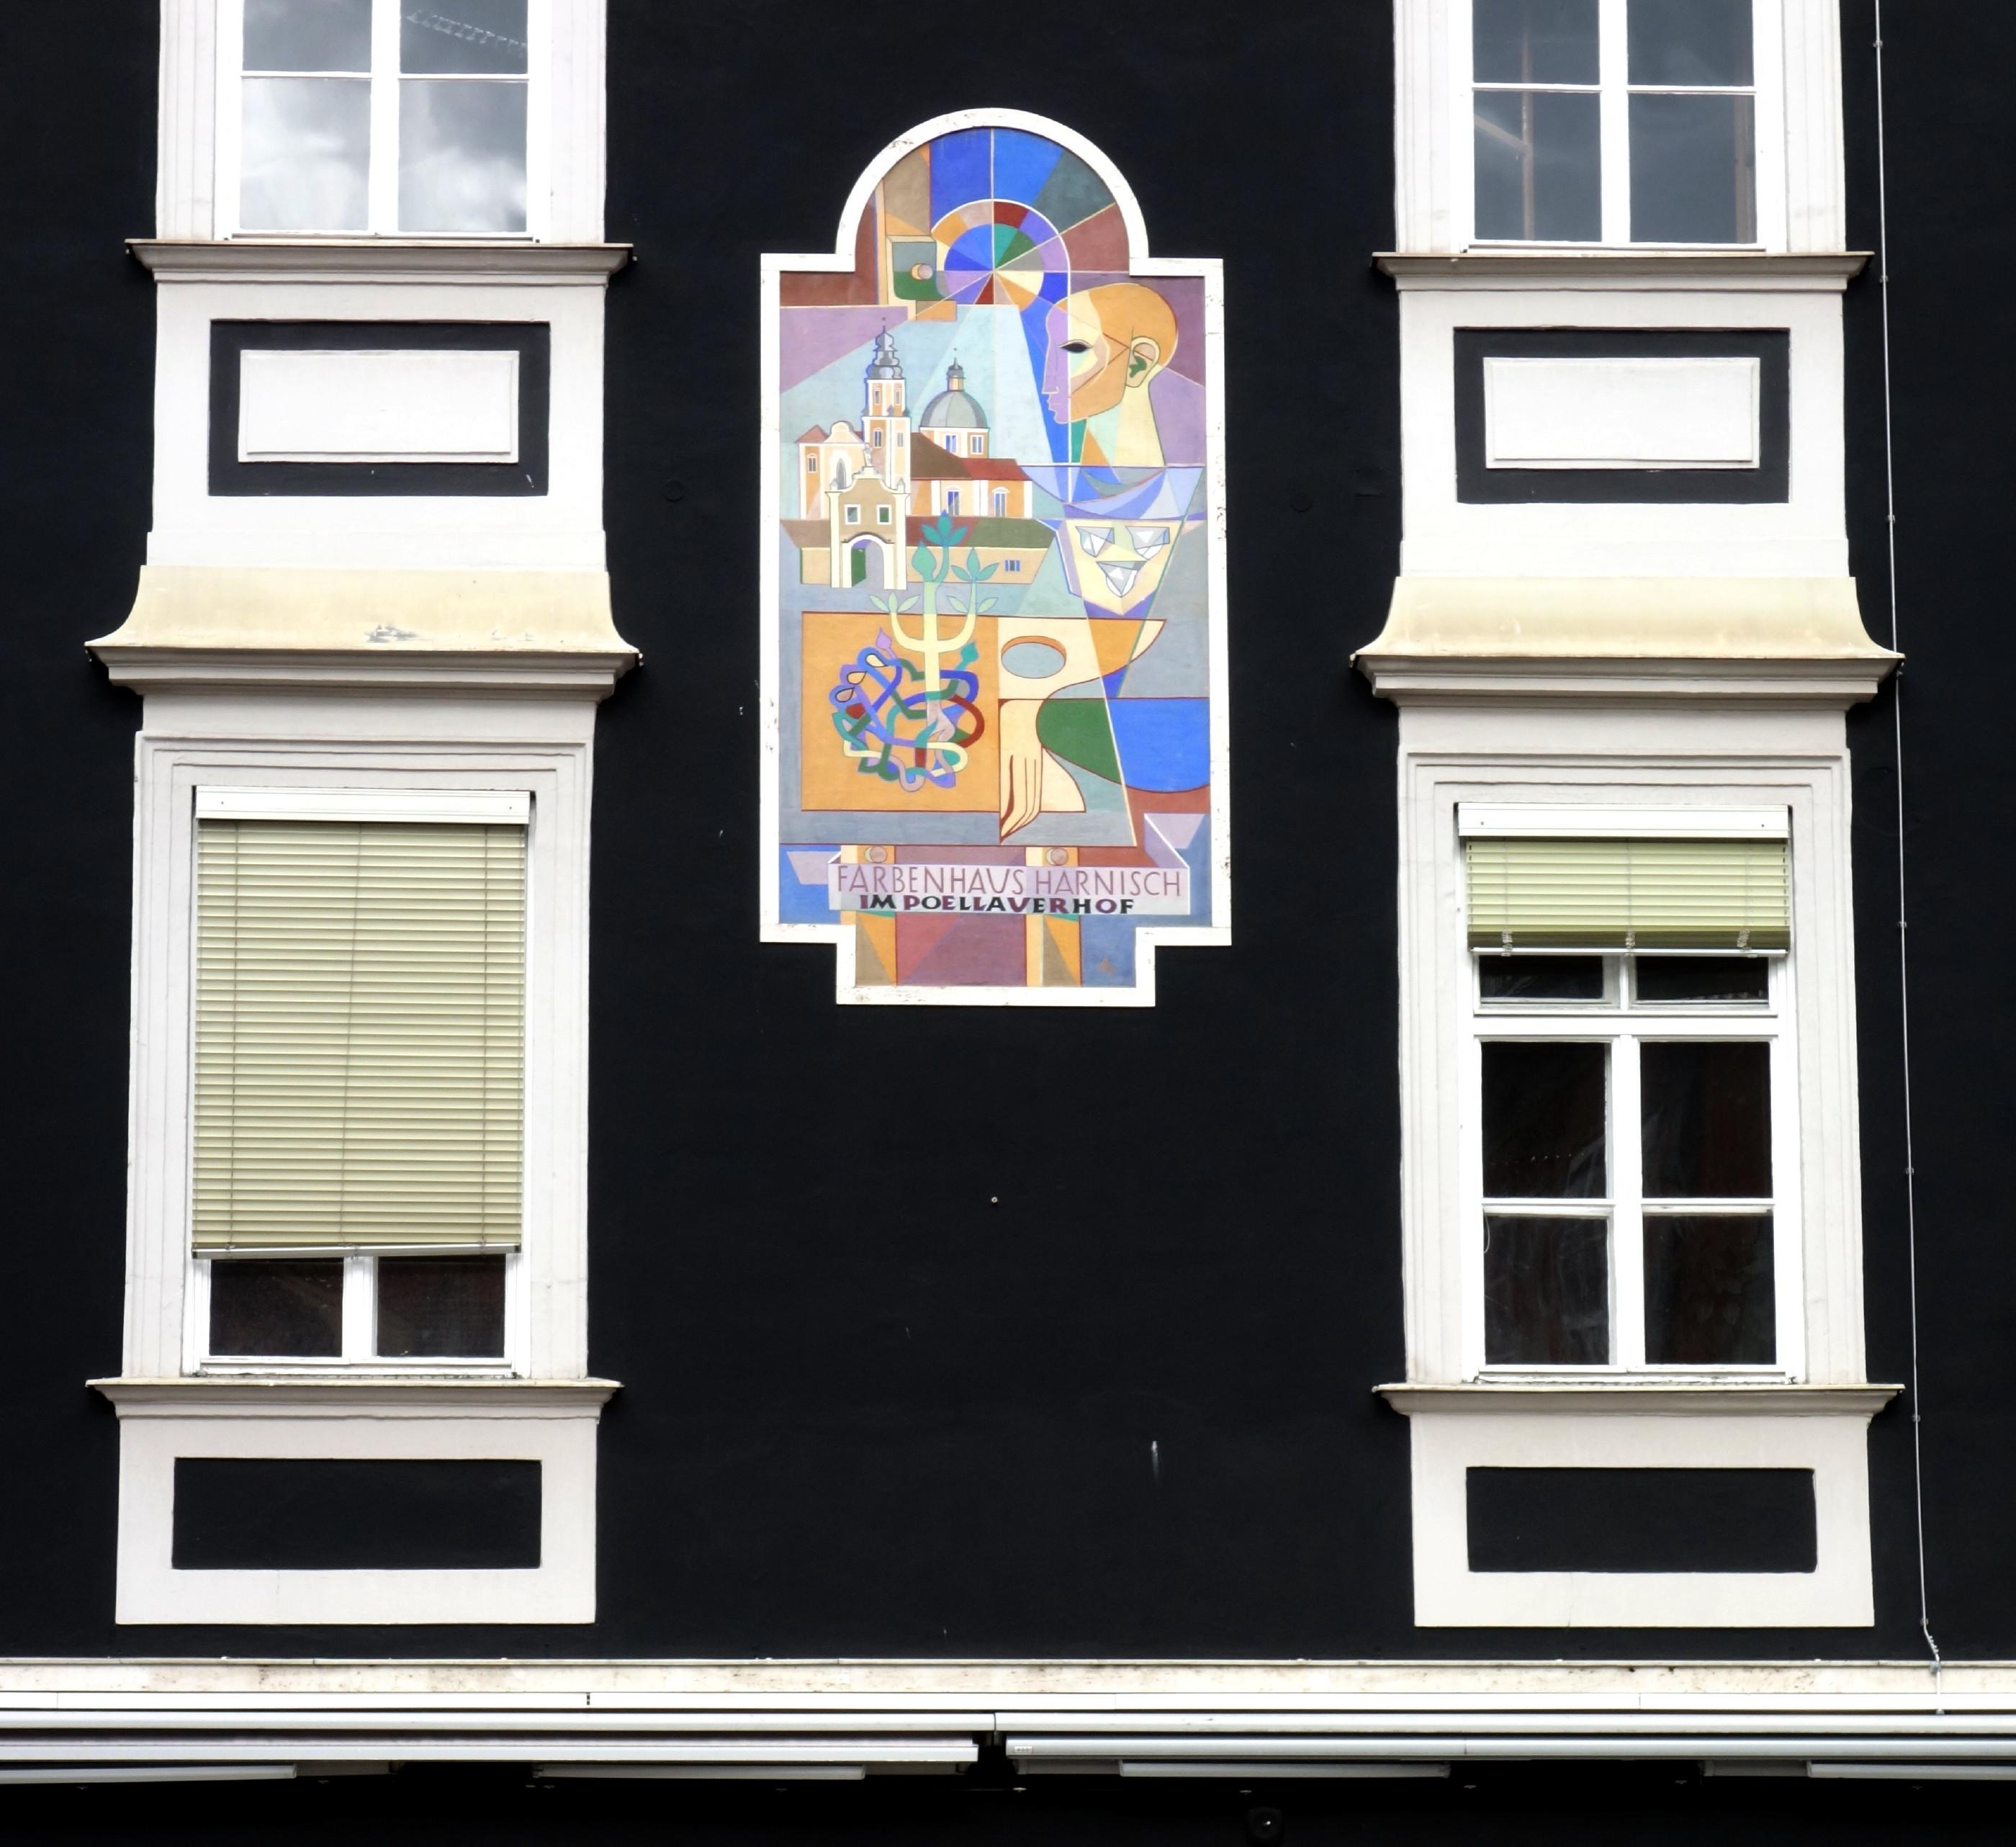 Datei Farbenhaus Harnisch Id1238 Dsc05103 Jpg Wikipedia